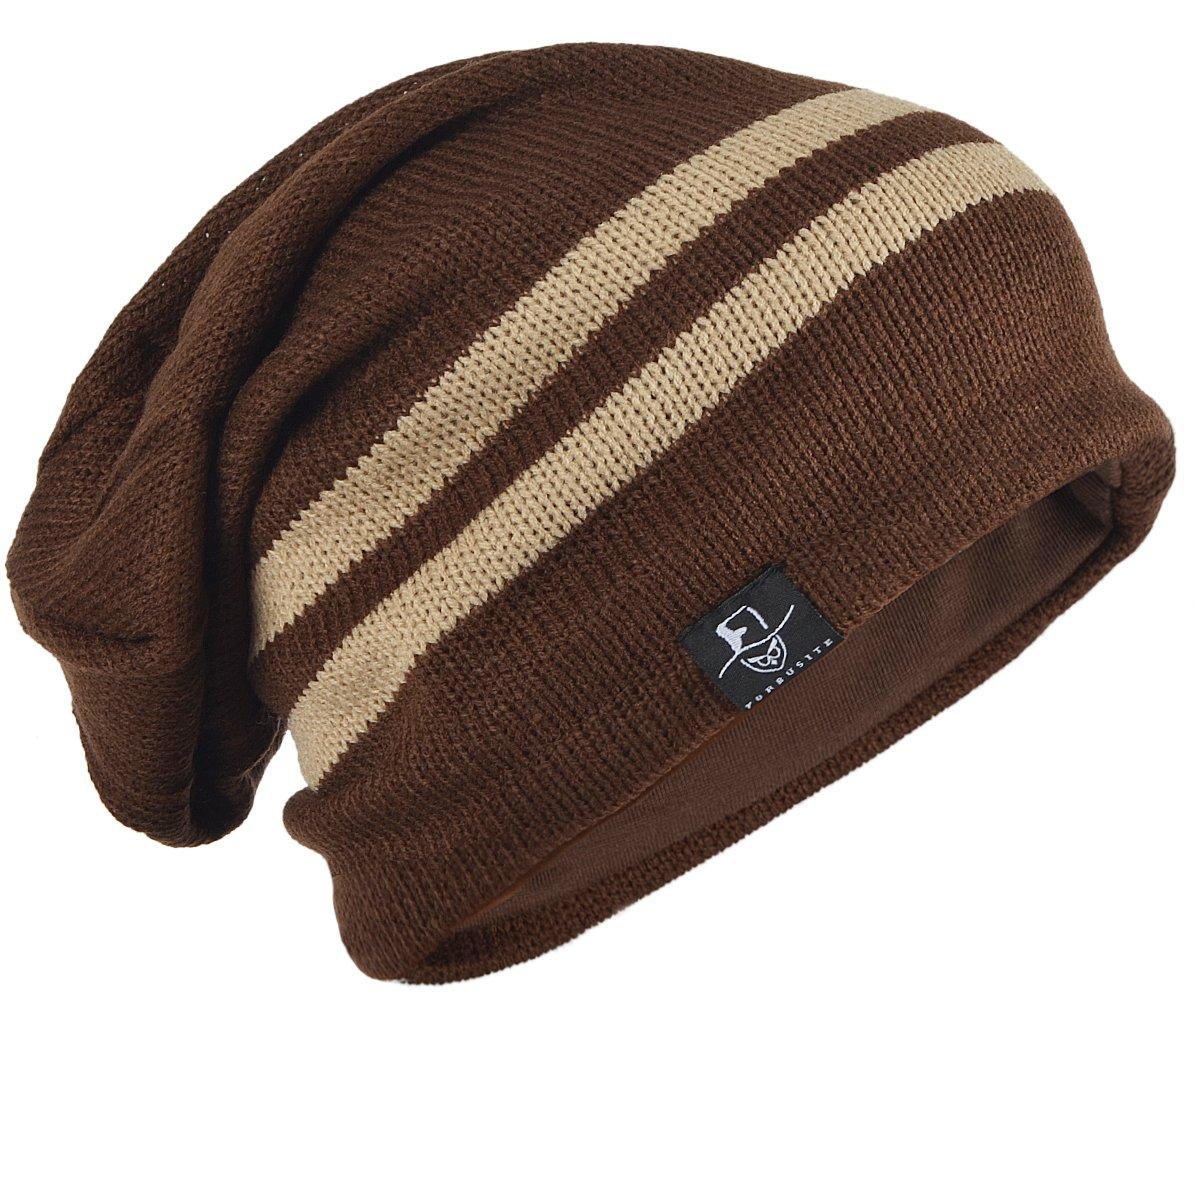 3ecf55de84d Vintage Men Baggy Beanie Slouchy Knit Skull Cap Hat (B318-Brown ...